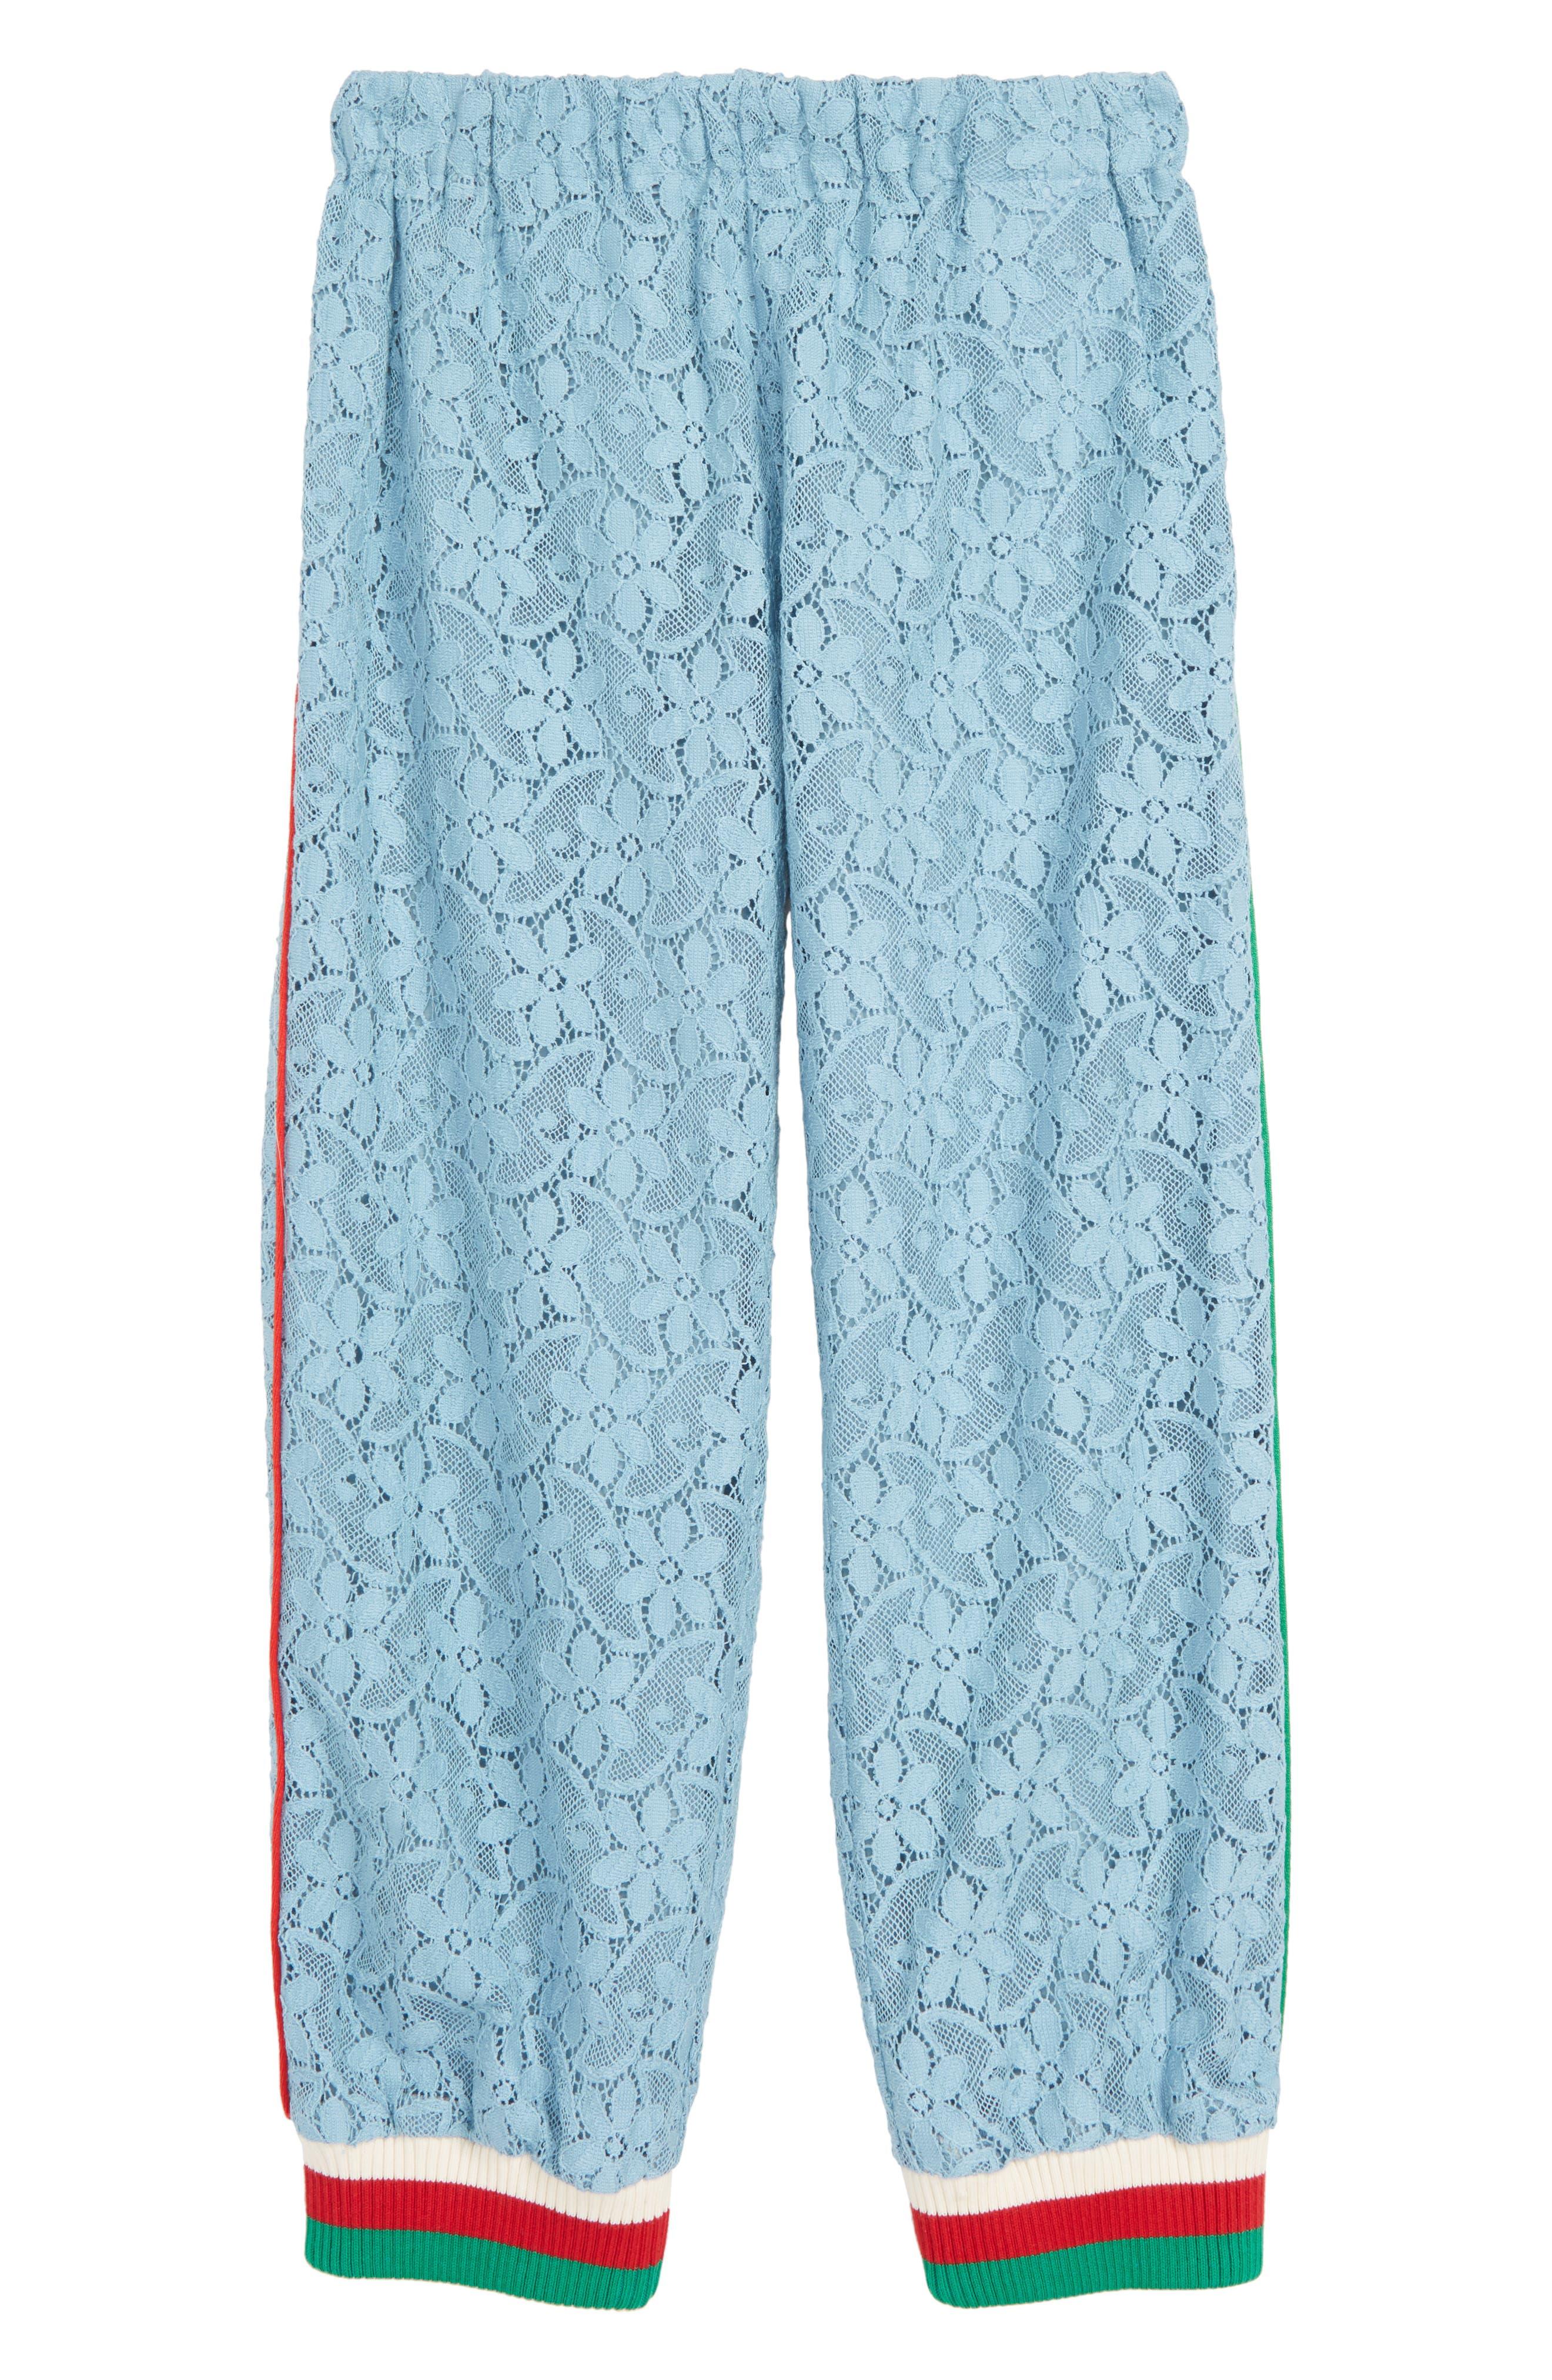 GUCCI,                             Lace Jogger Pants,                             Main thumbnail 1, color,                             SEA CLEAR BLUE